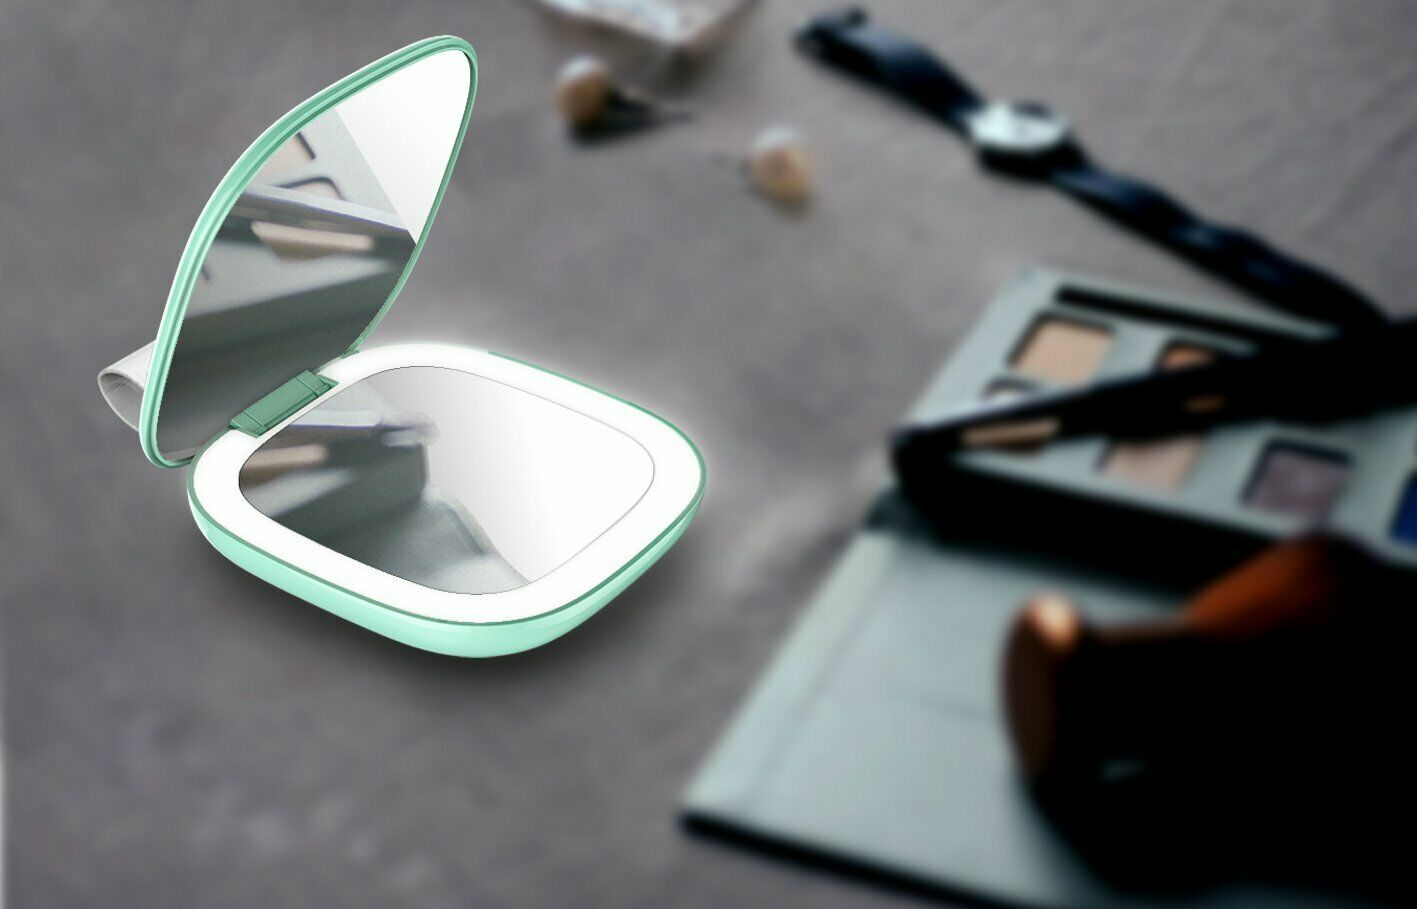 LED Lighted Travel Makeup Mirror, Handheld Illuminated Compa